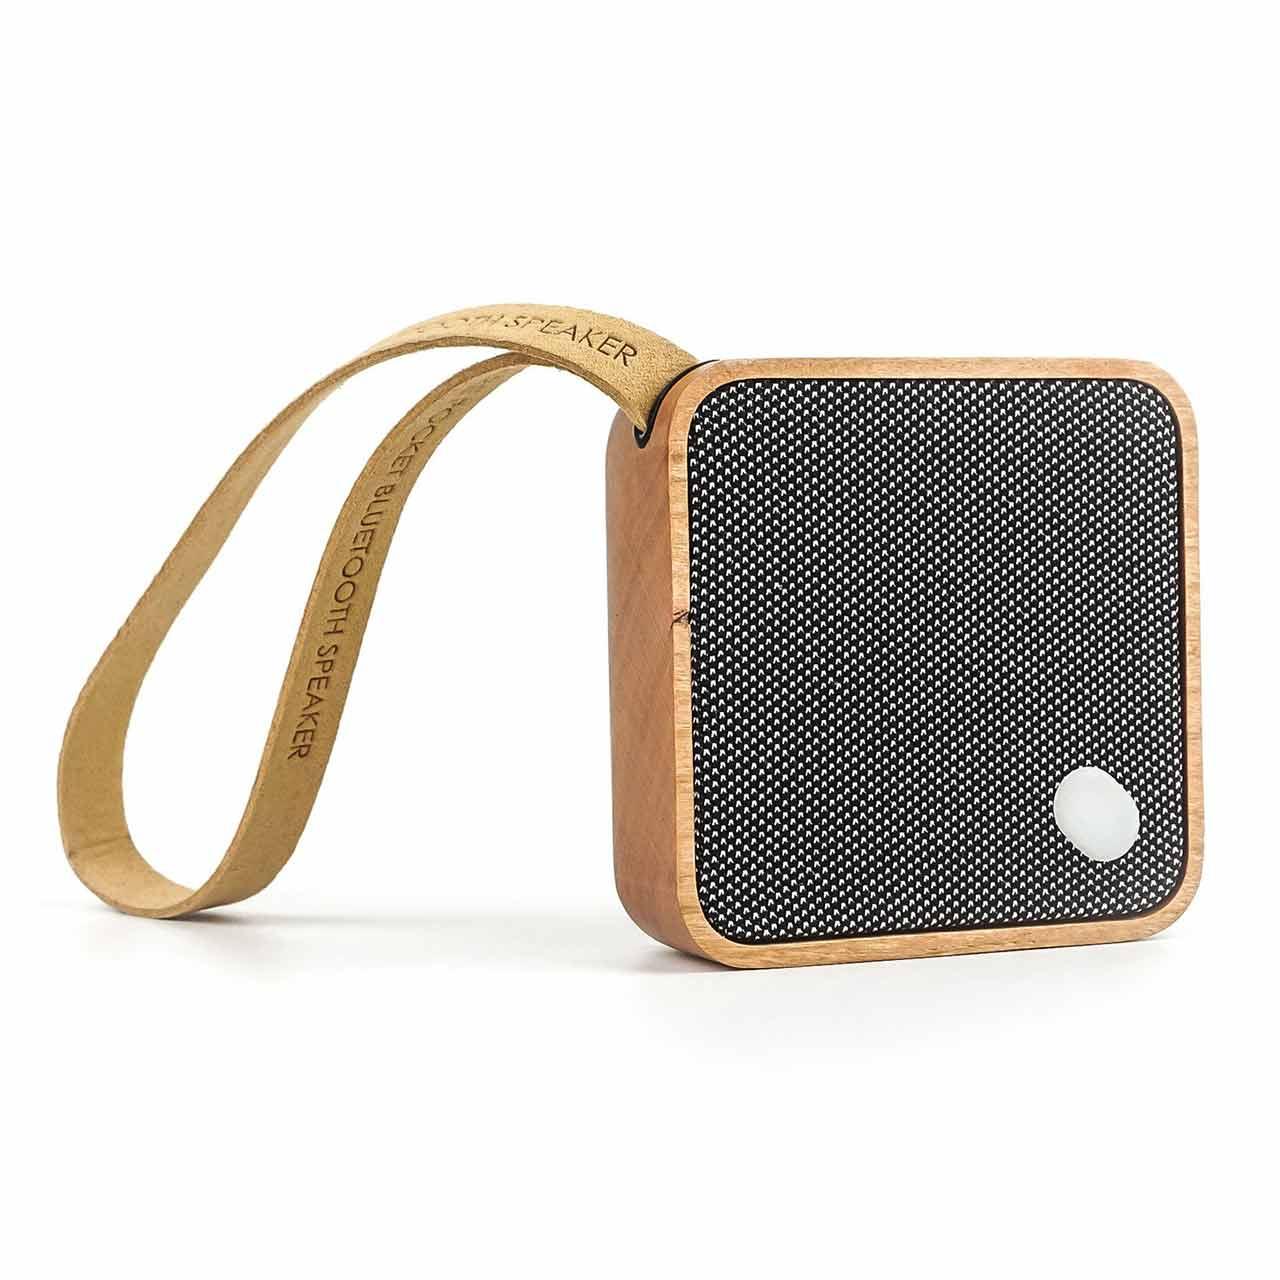 GINGKO Mi Square Pocket Bluetooth Speaker Cherry Wood | the design gift shop